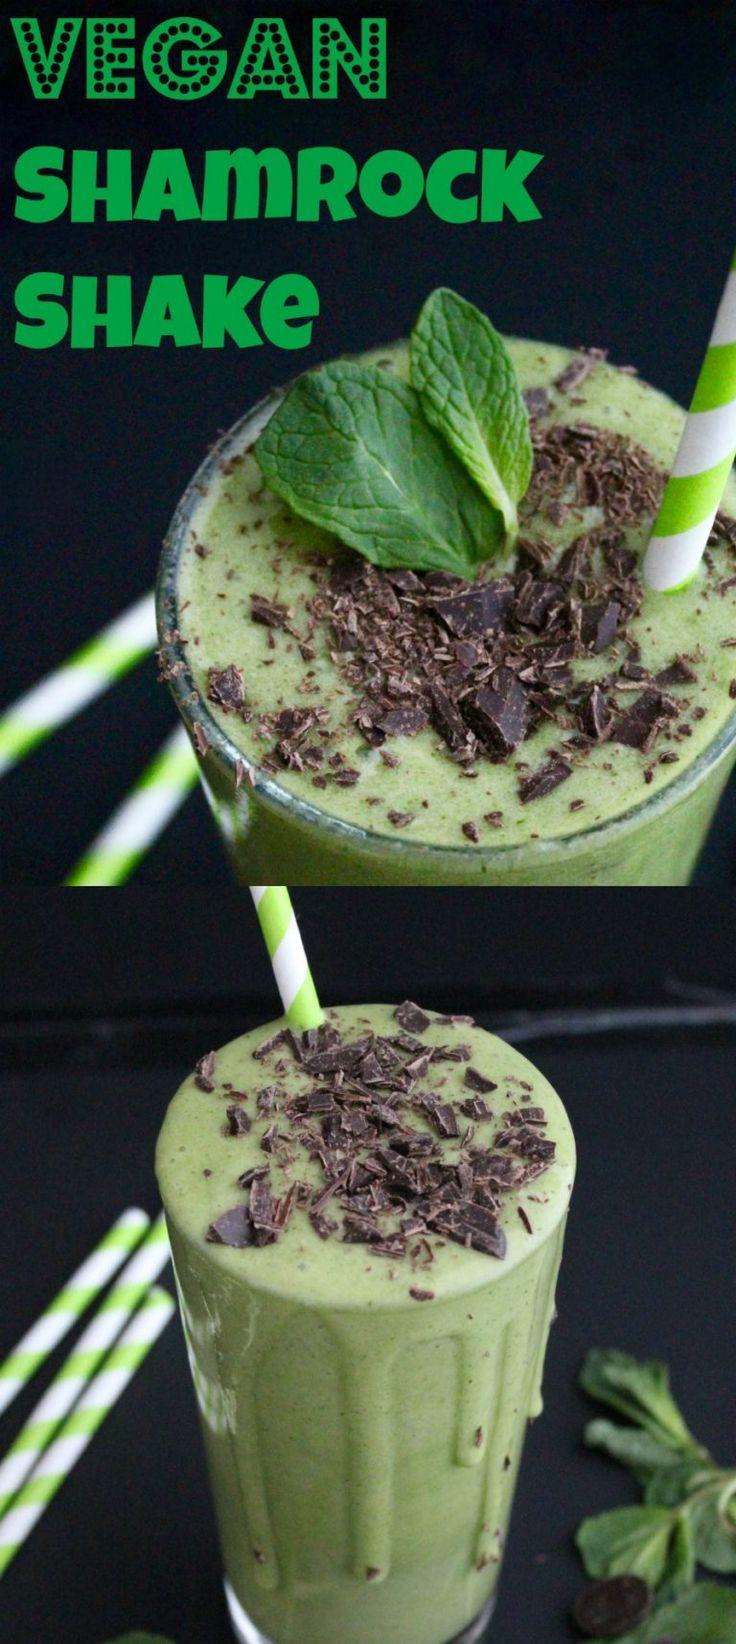 Vegan Shamrock Shake! Naturally sweetened and nothing fake! So healthy!